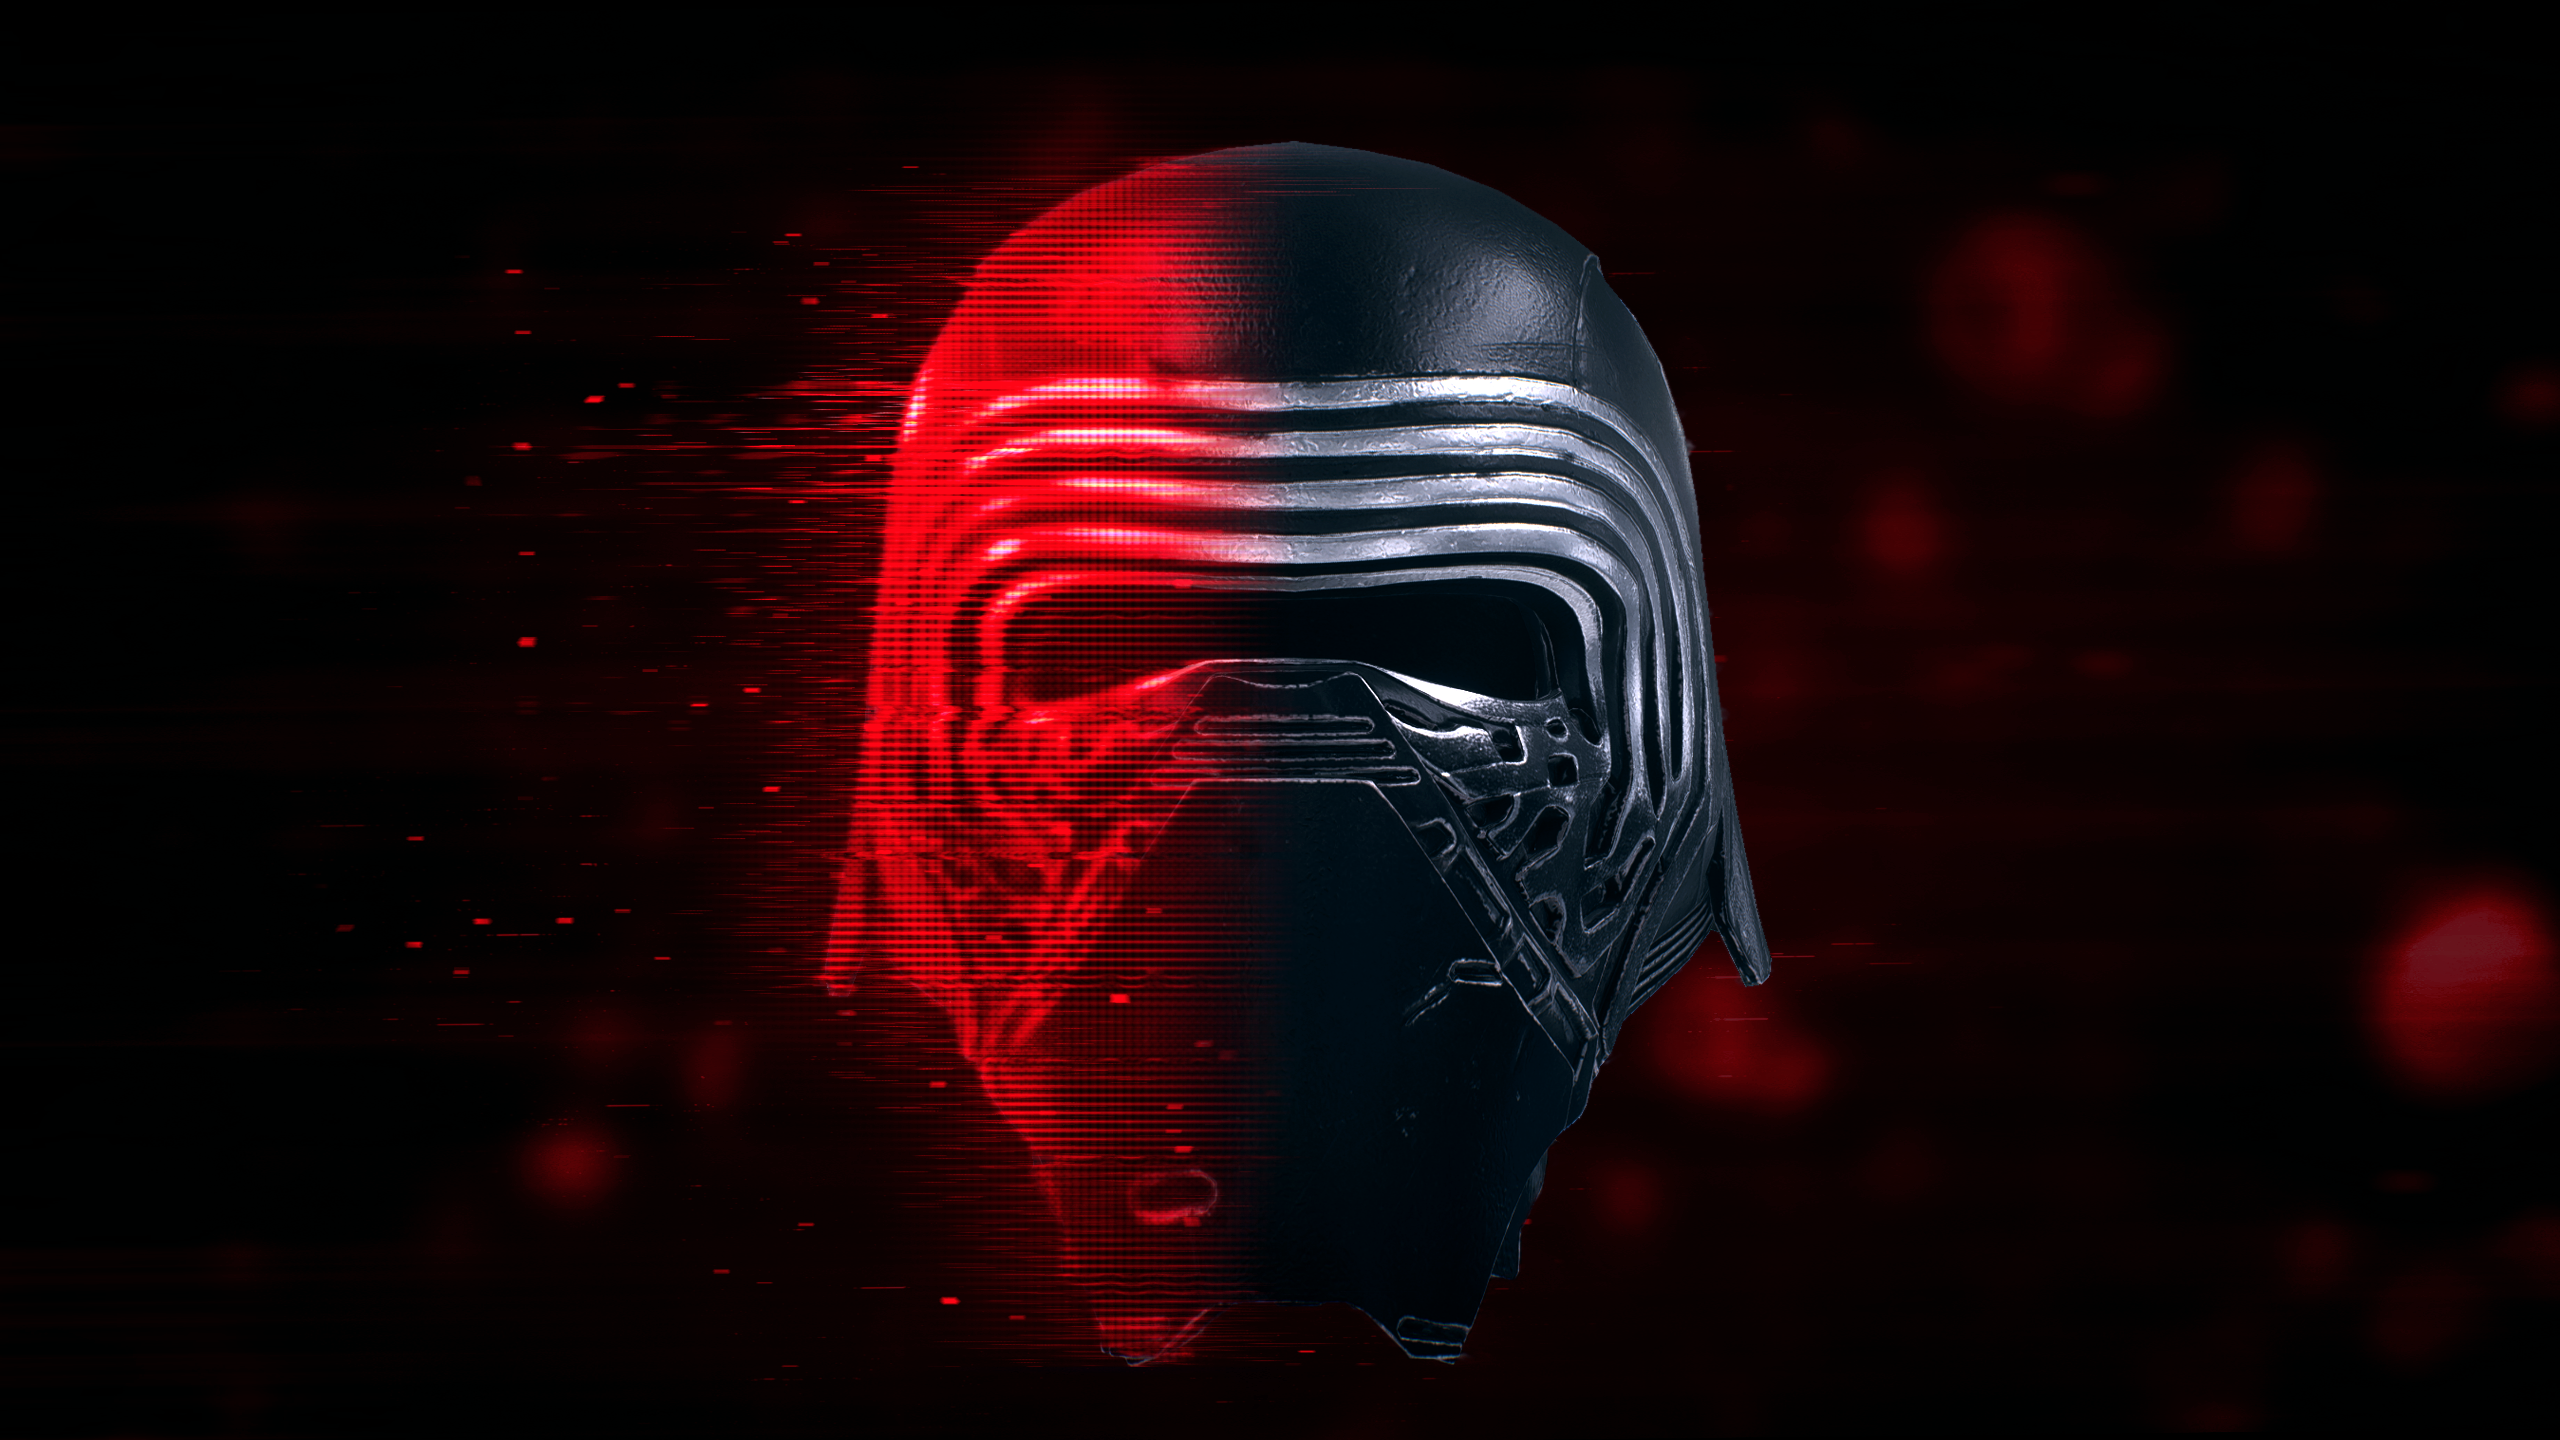 Kylo Ren Mask Wallpapers Top Free Kylo Ren Mask Backgrounds Wallpaperaccess